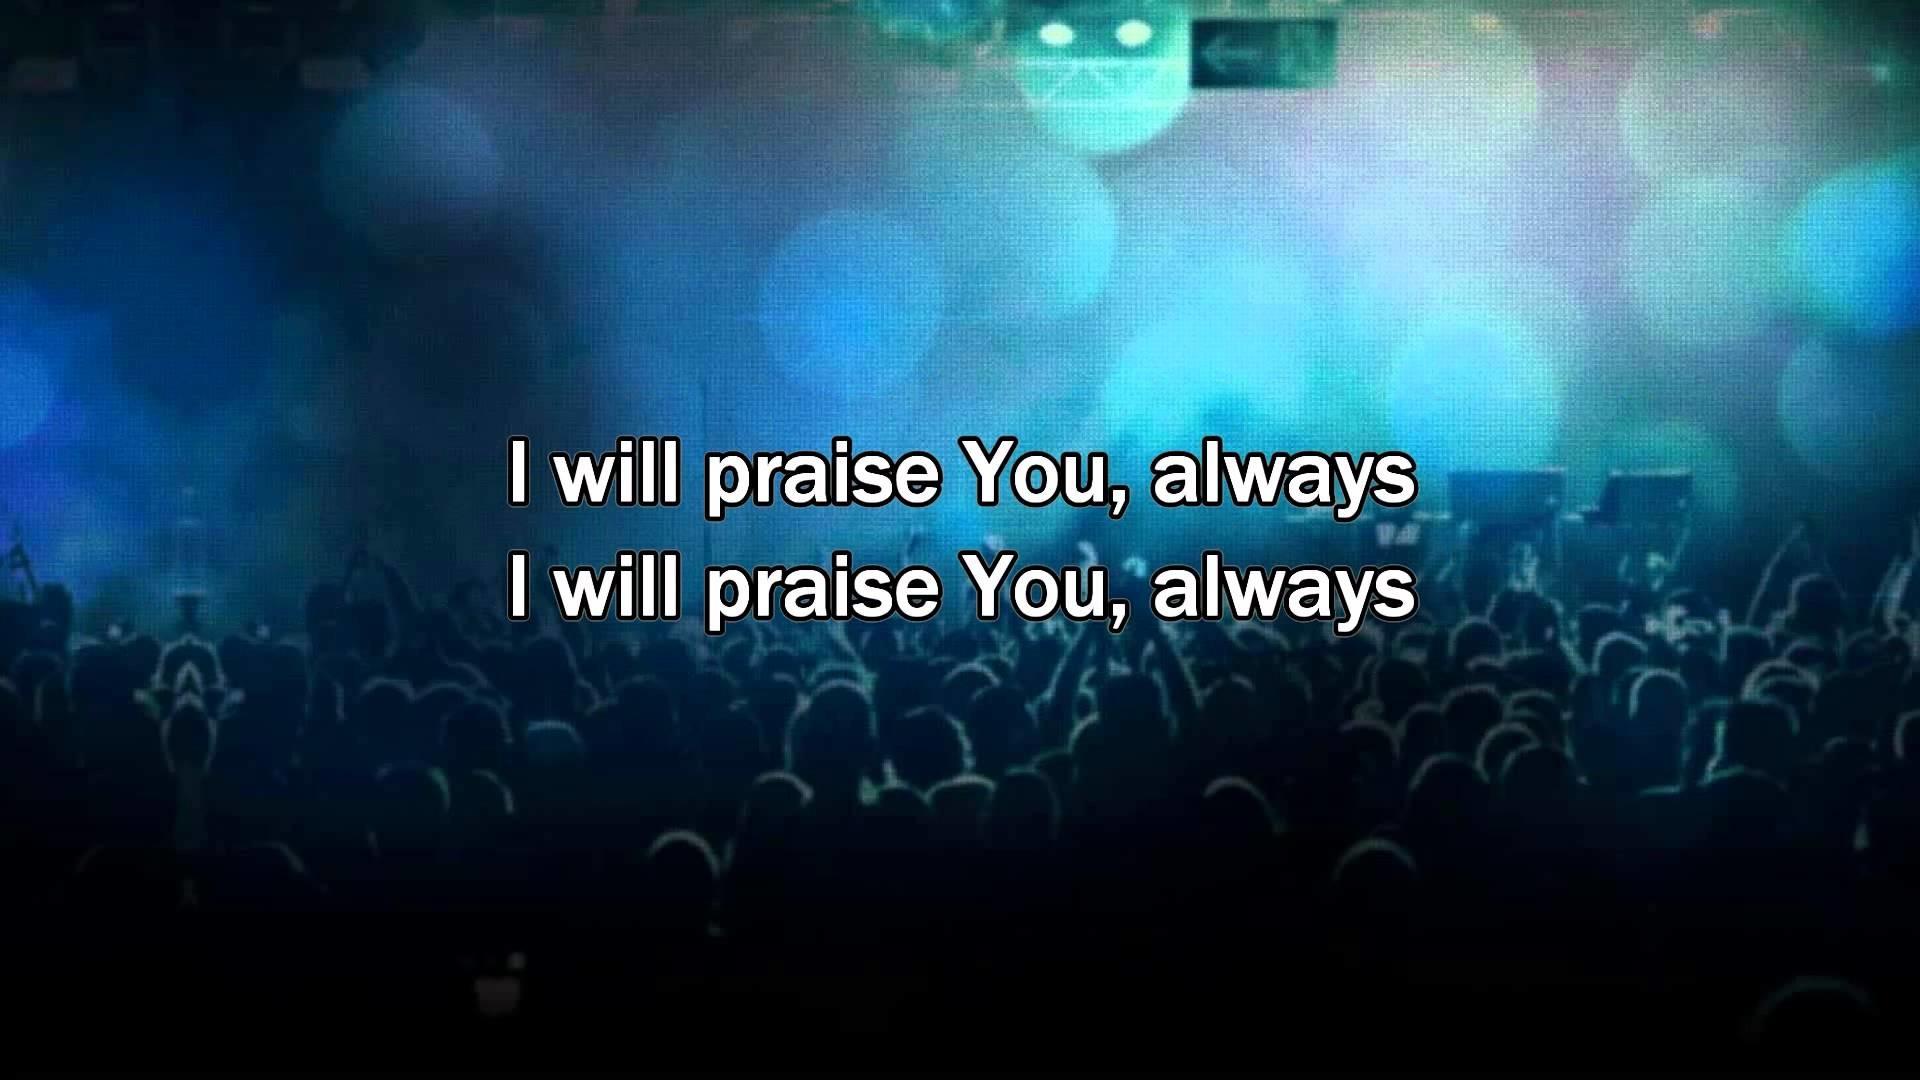 What A Saviour – Hillsong Worship (2015 New Worship Song with Lyrics) –  YouTube